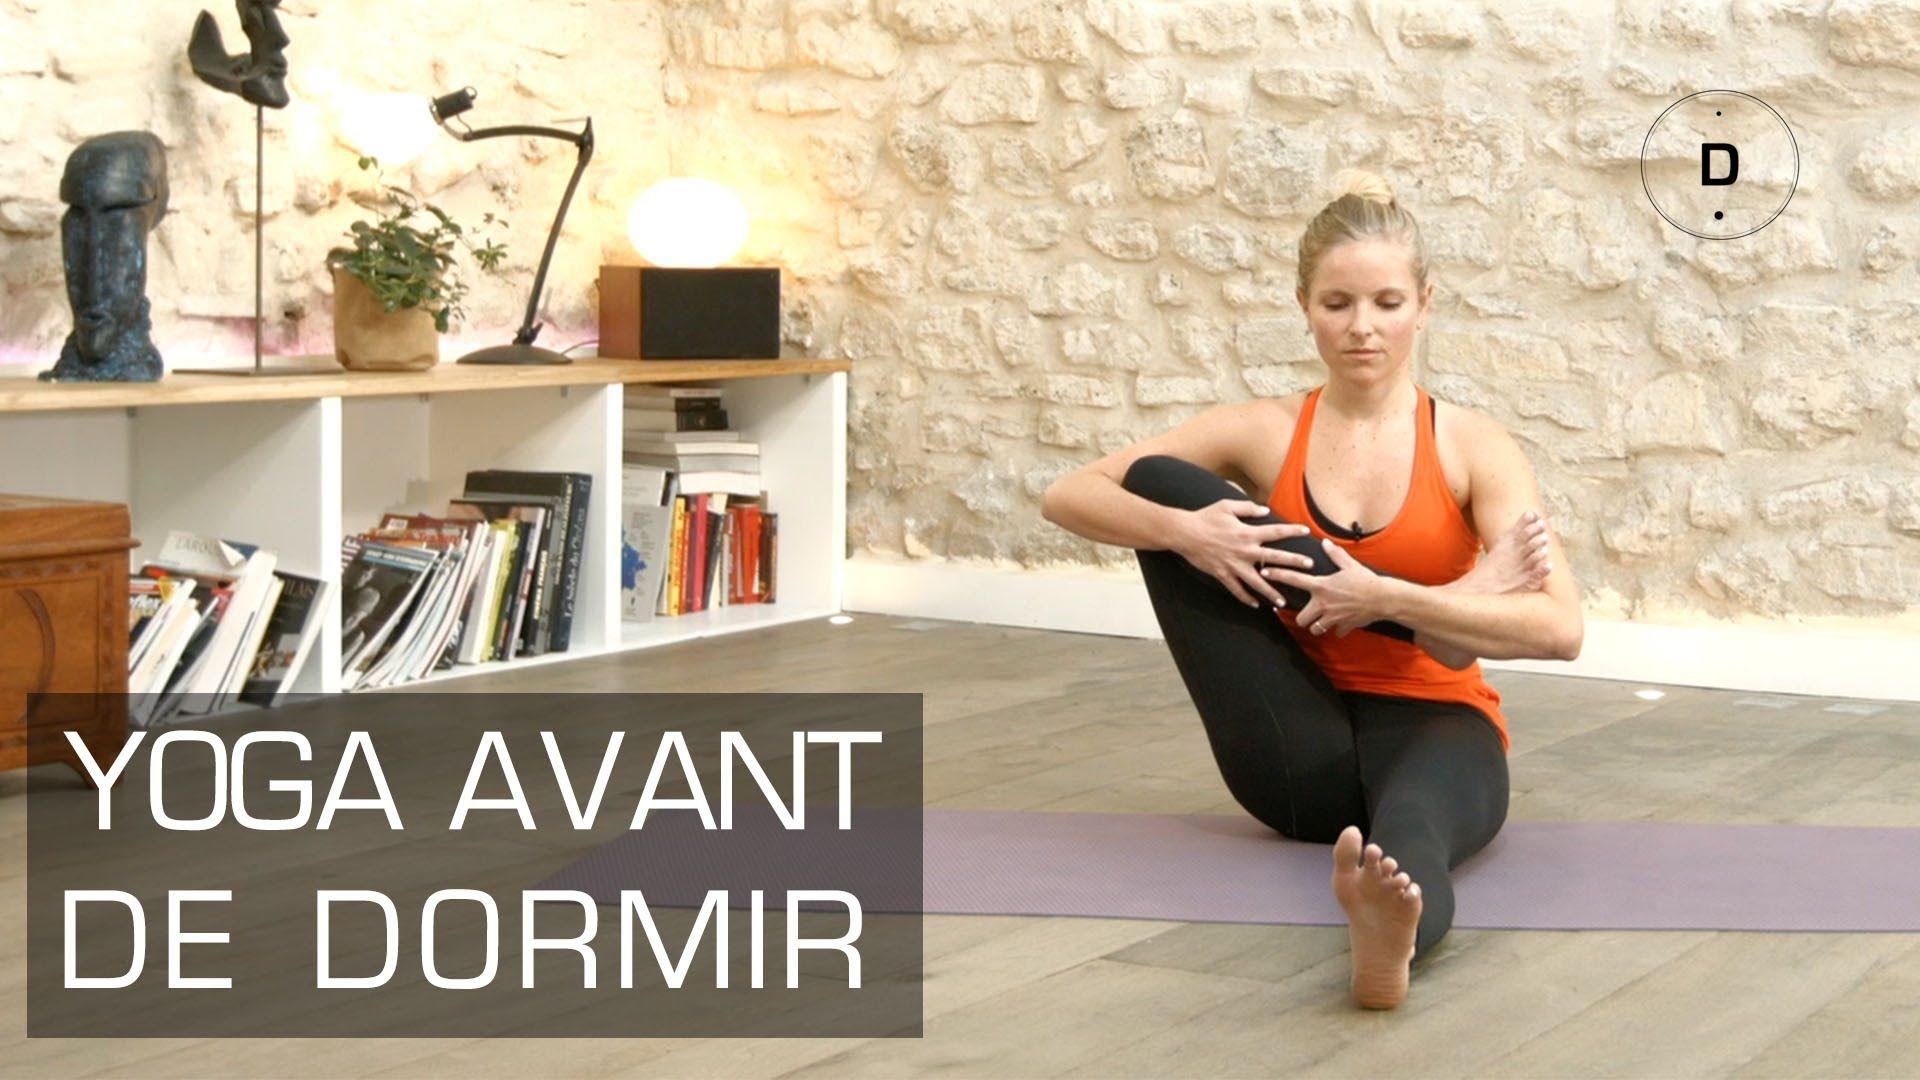 Yoga Master Class Yoga Avant De Dormir Yoga Du Soir Professeur De Yoga Yoga Detente